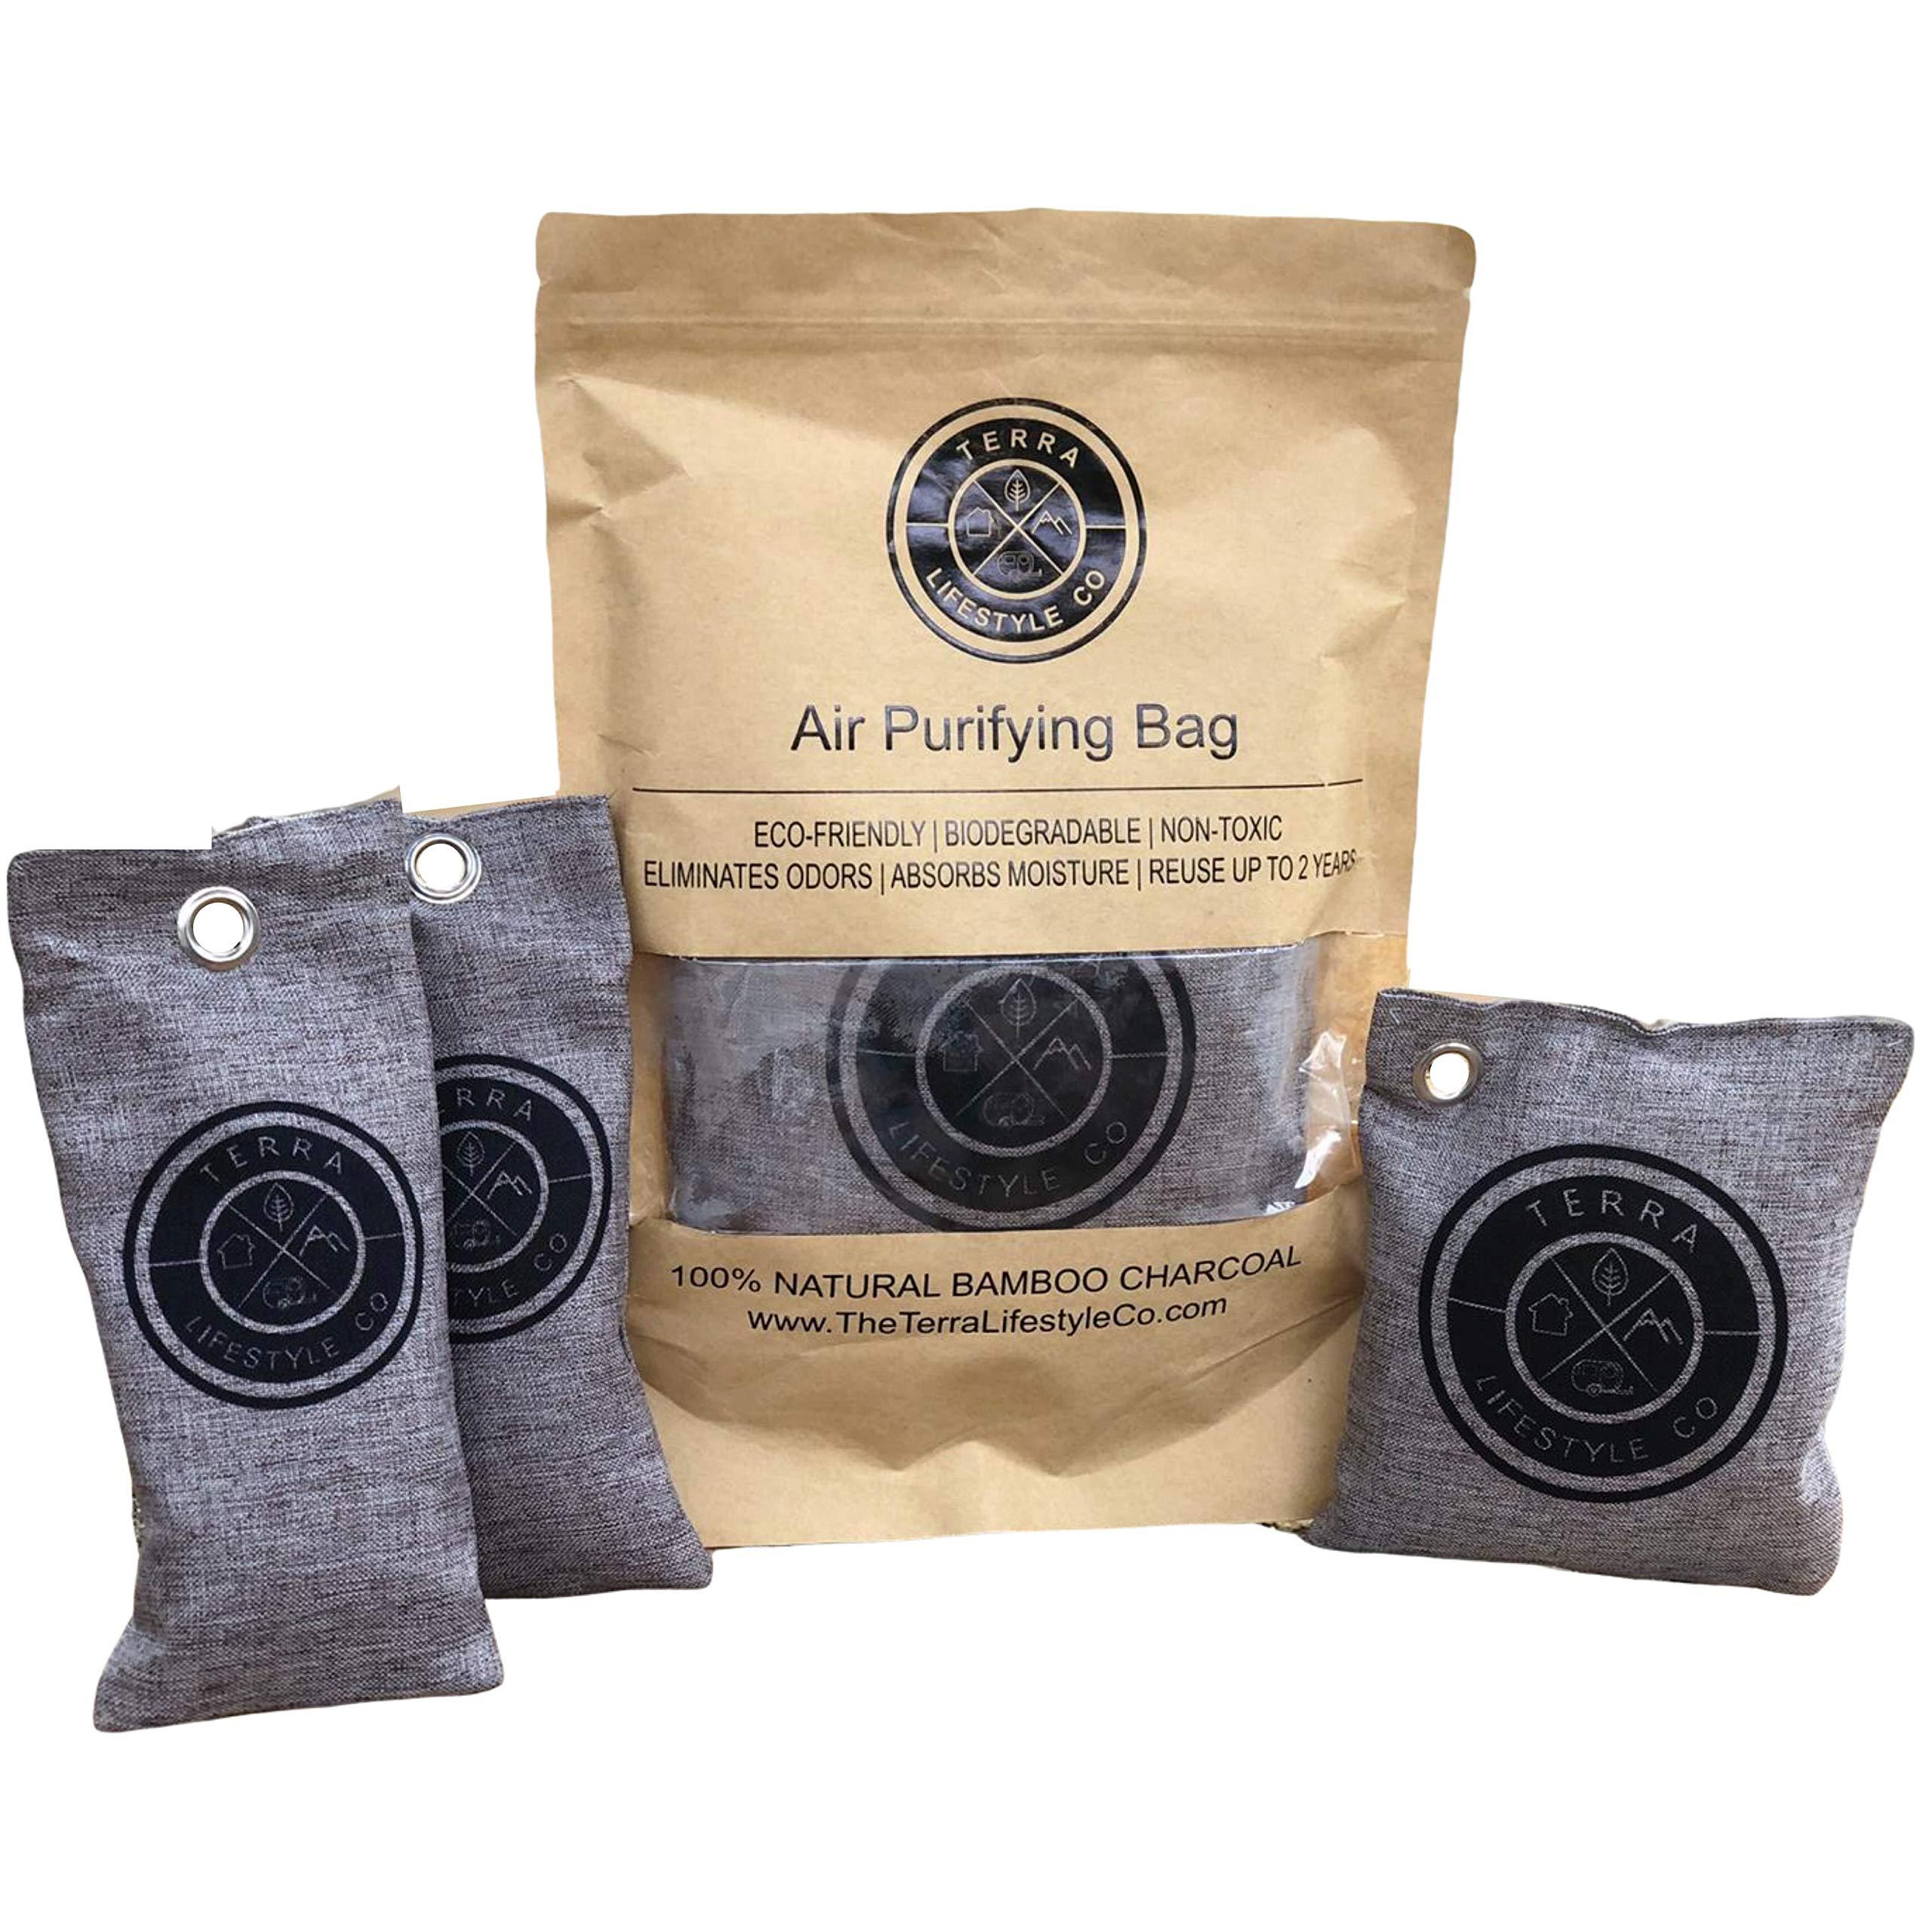 Terra Lifestyle Co -Bamboo Charcoal Air Purifying Bag - Gym Bag Set | Shoe Deodorizer, Shoe Odor Eliminator, Shoe Bag Odor Absorber, Sports Bag Shoe Deodorizers, Sneaker Balls, Odor Eaters, Freshener